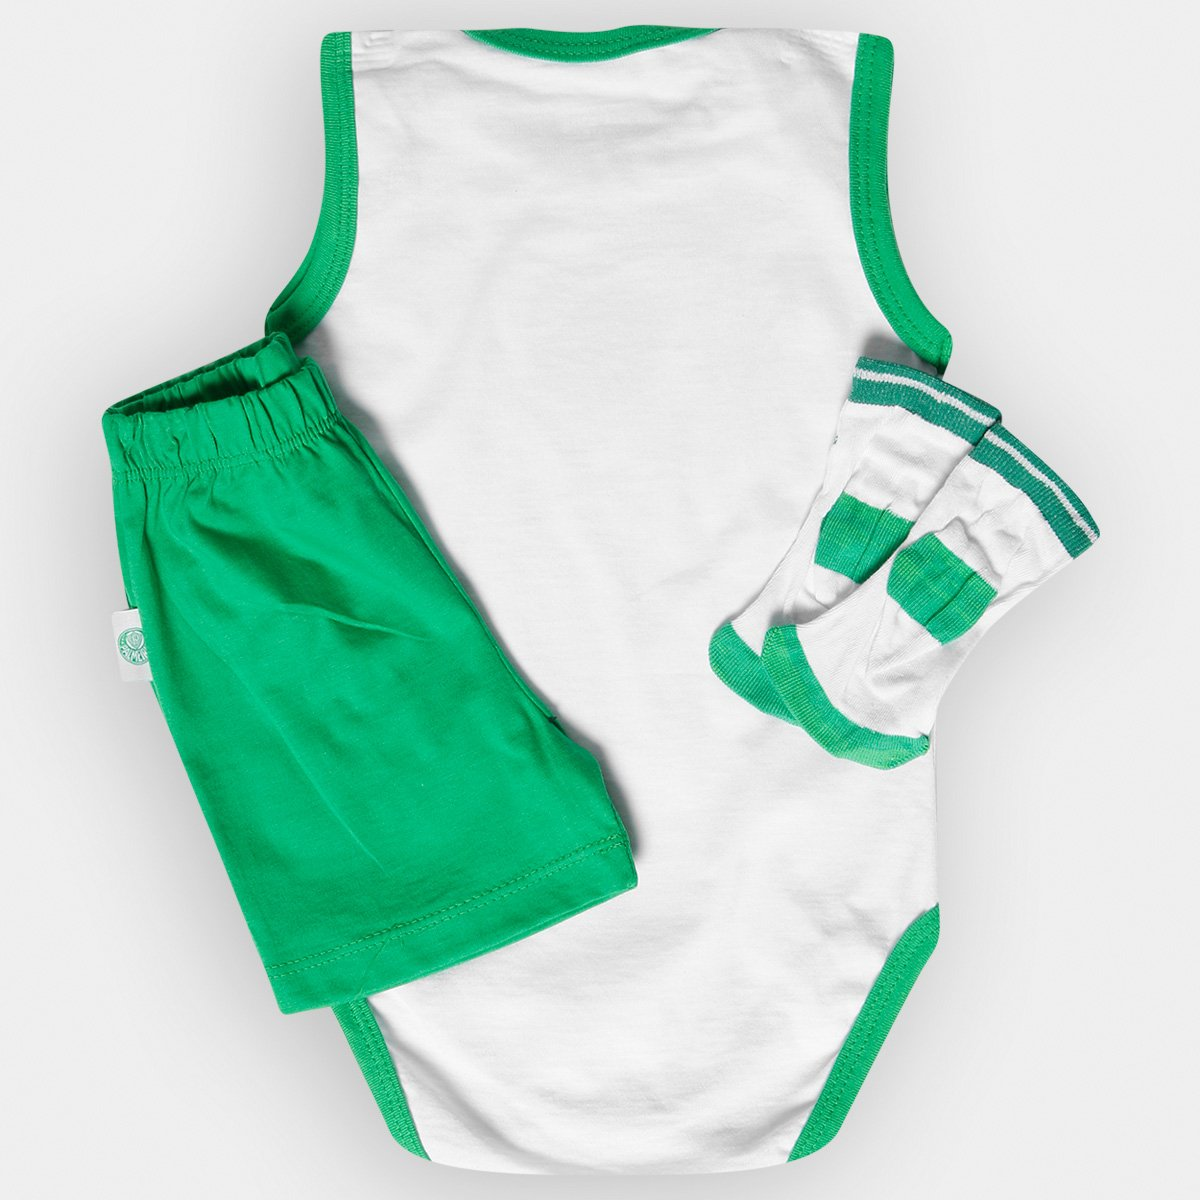 1a99c6ee37 Conjunto Body Regata Shorts e Meia Palmeiras Infantil - Verde e ...